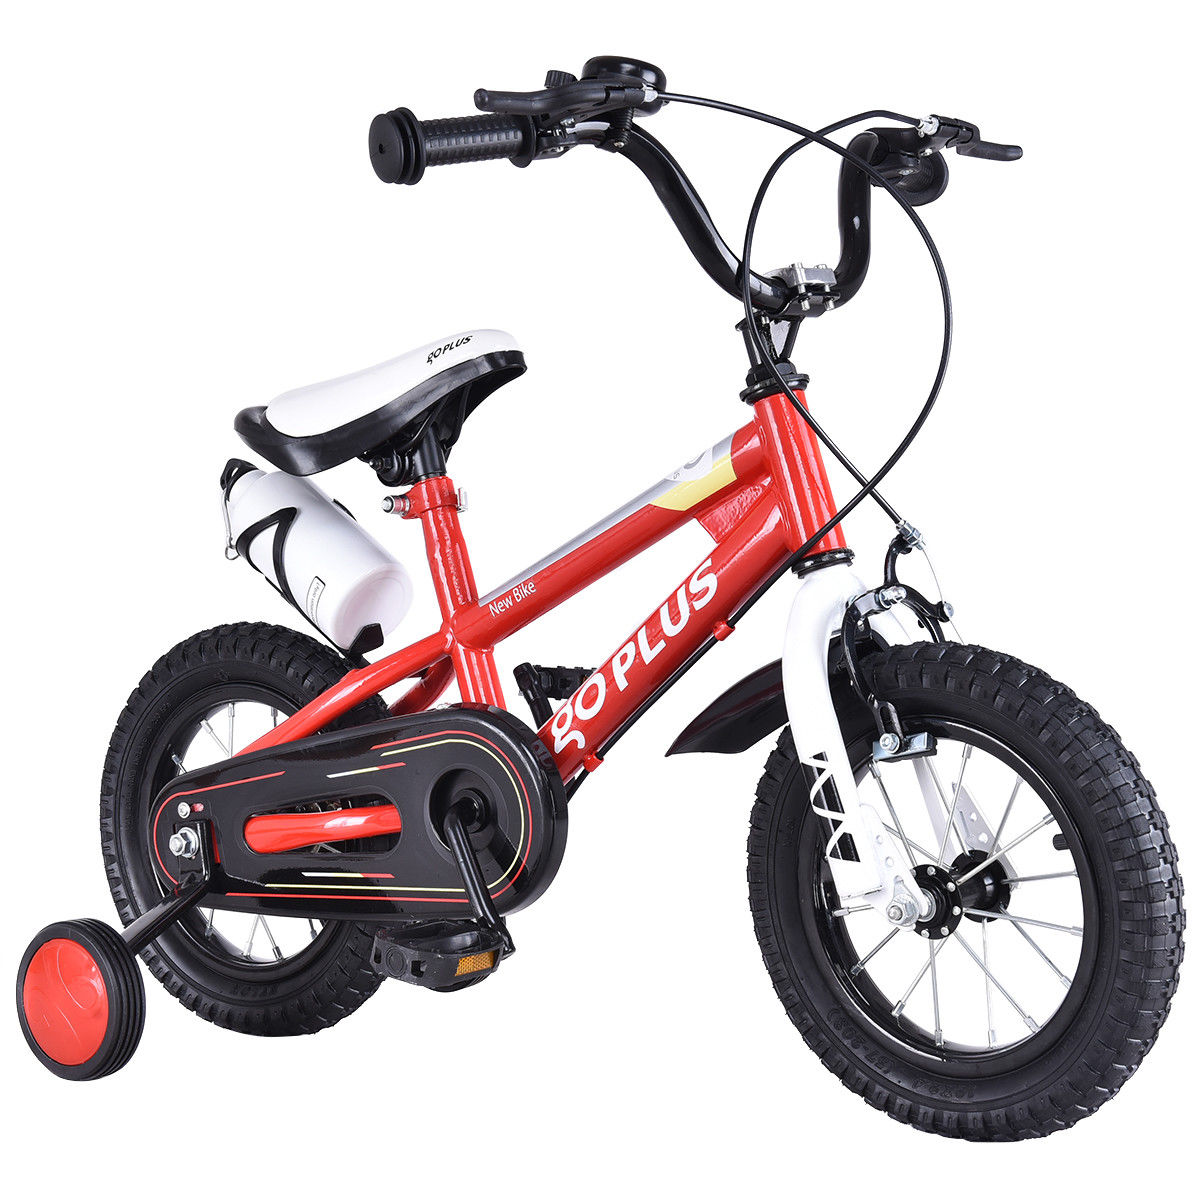 "Goplus 20"" Freestyle Kids Bike Bicycle Children Boys & Girls Gift w Training Wheels... by Goplus"